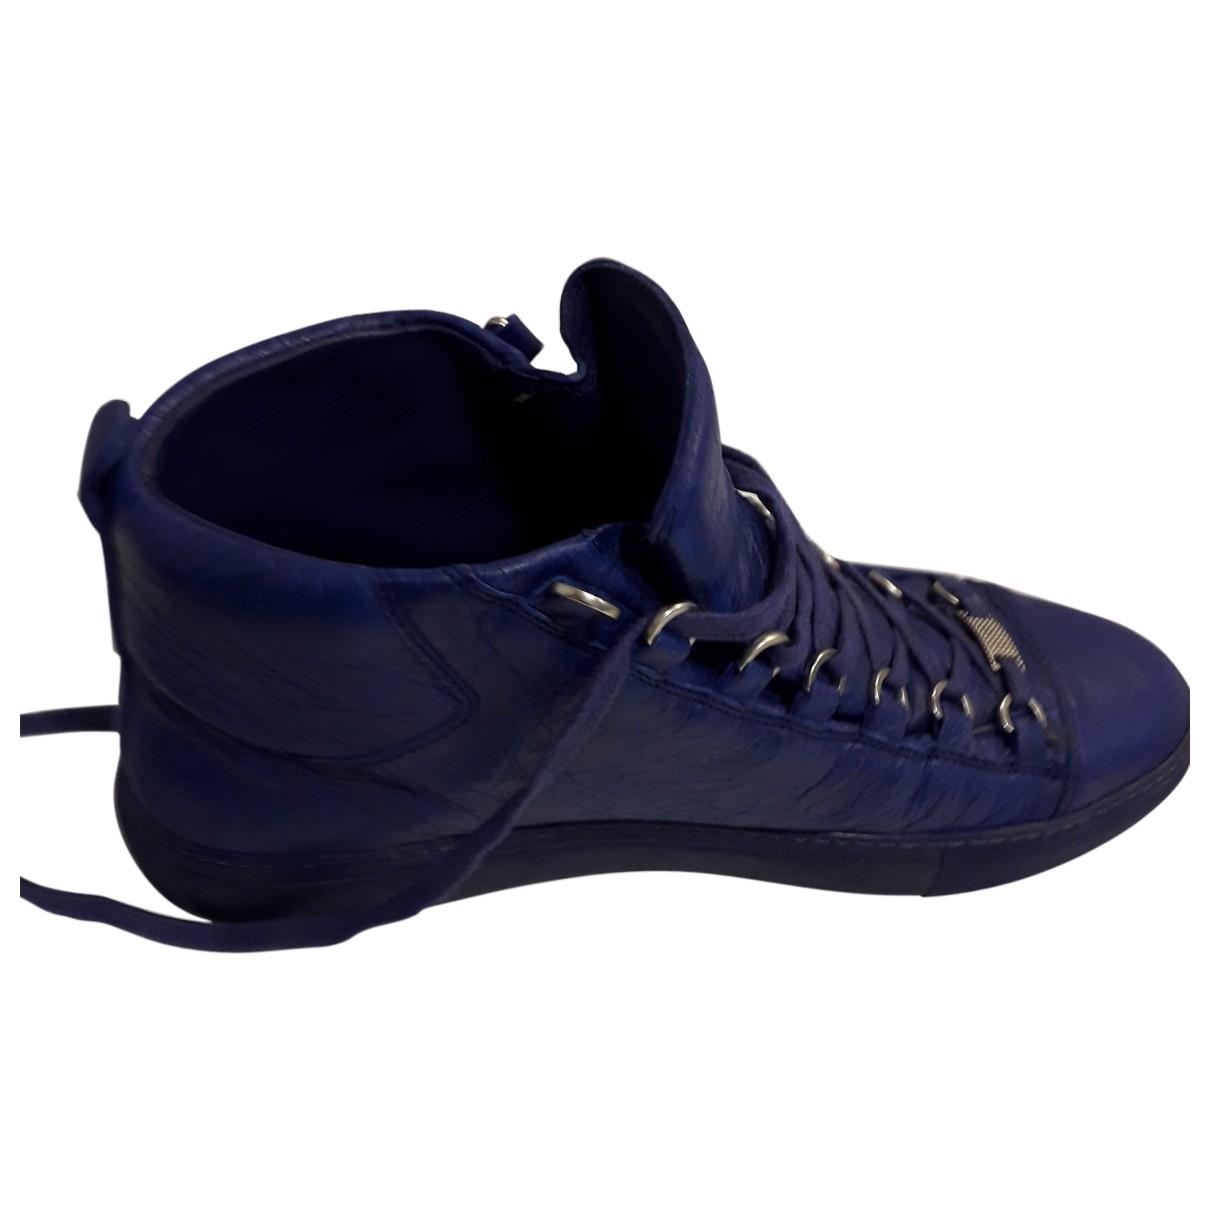 Balenciaga Arena Navy Leather Trainers for Men 42 EU